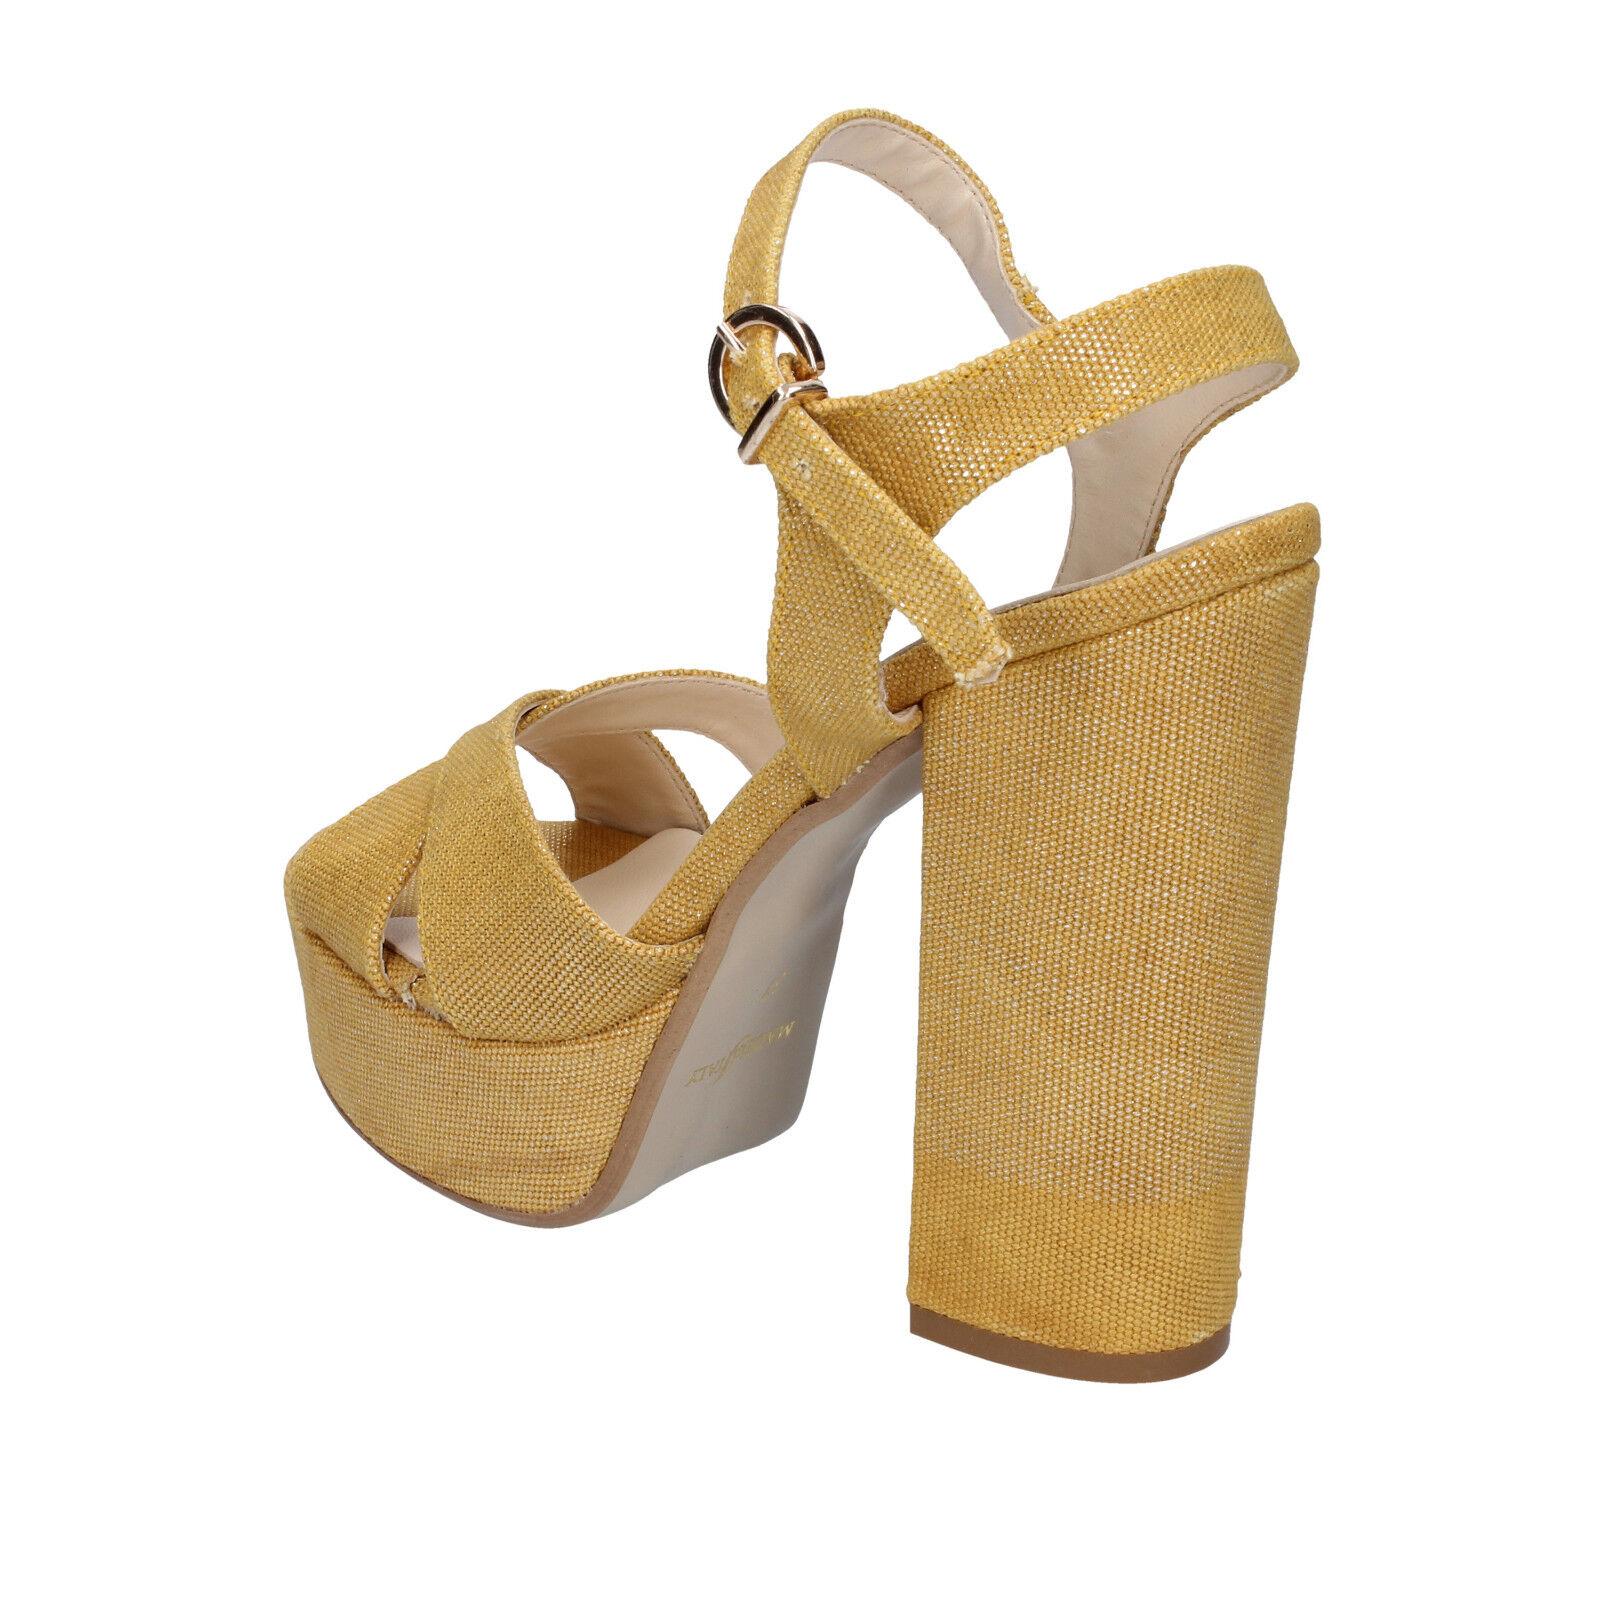 donna GENEVE GENEVE donna SHOES 36 sandali giallo tessuto BZ892-B a32b25